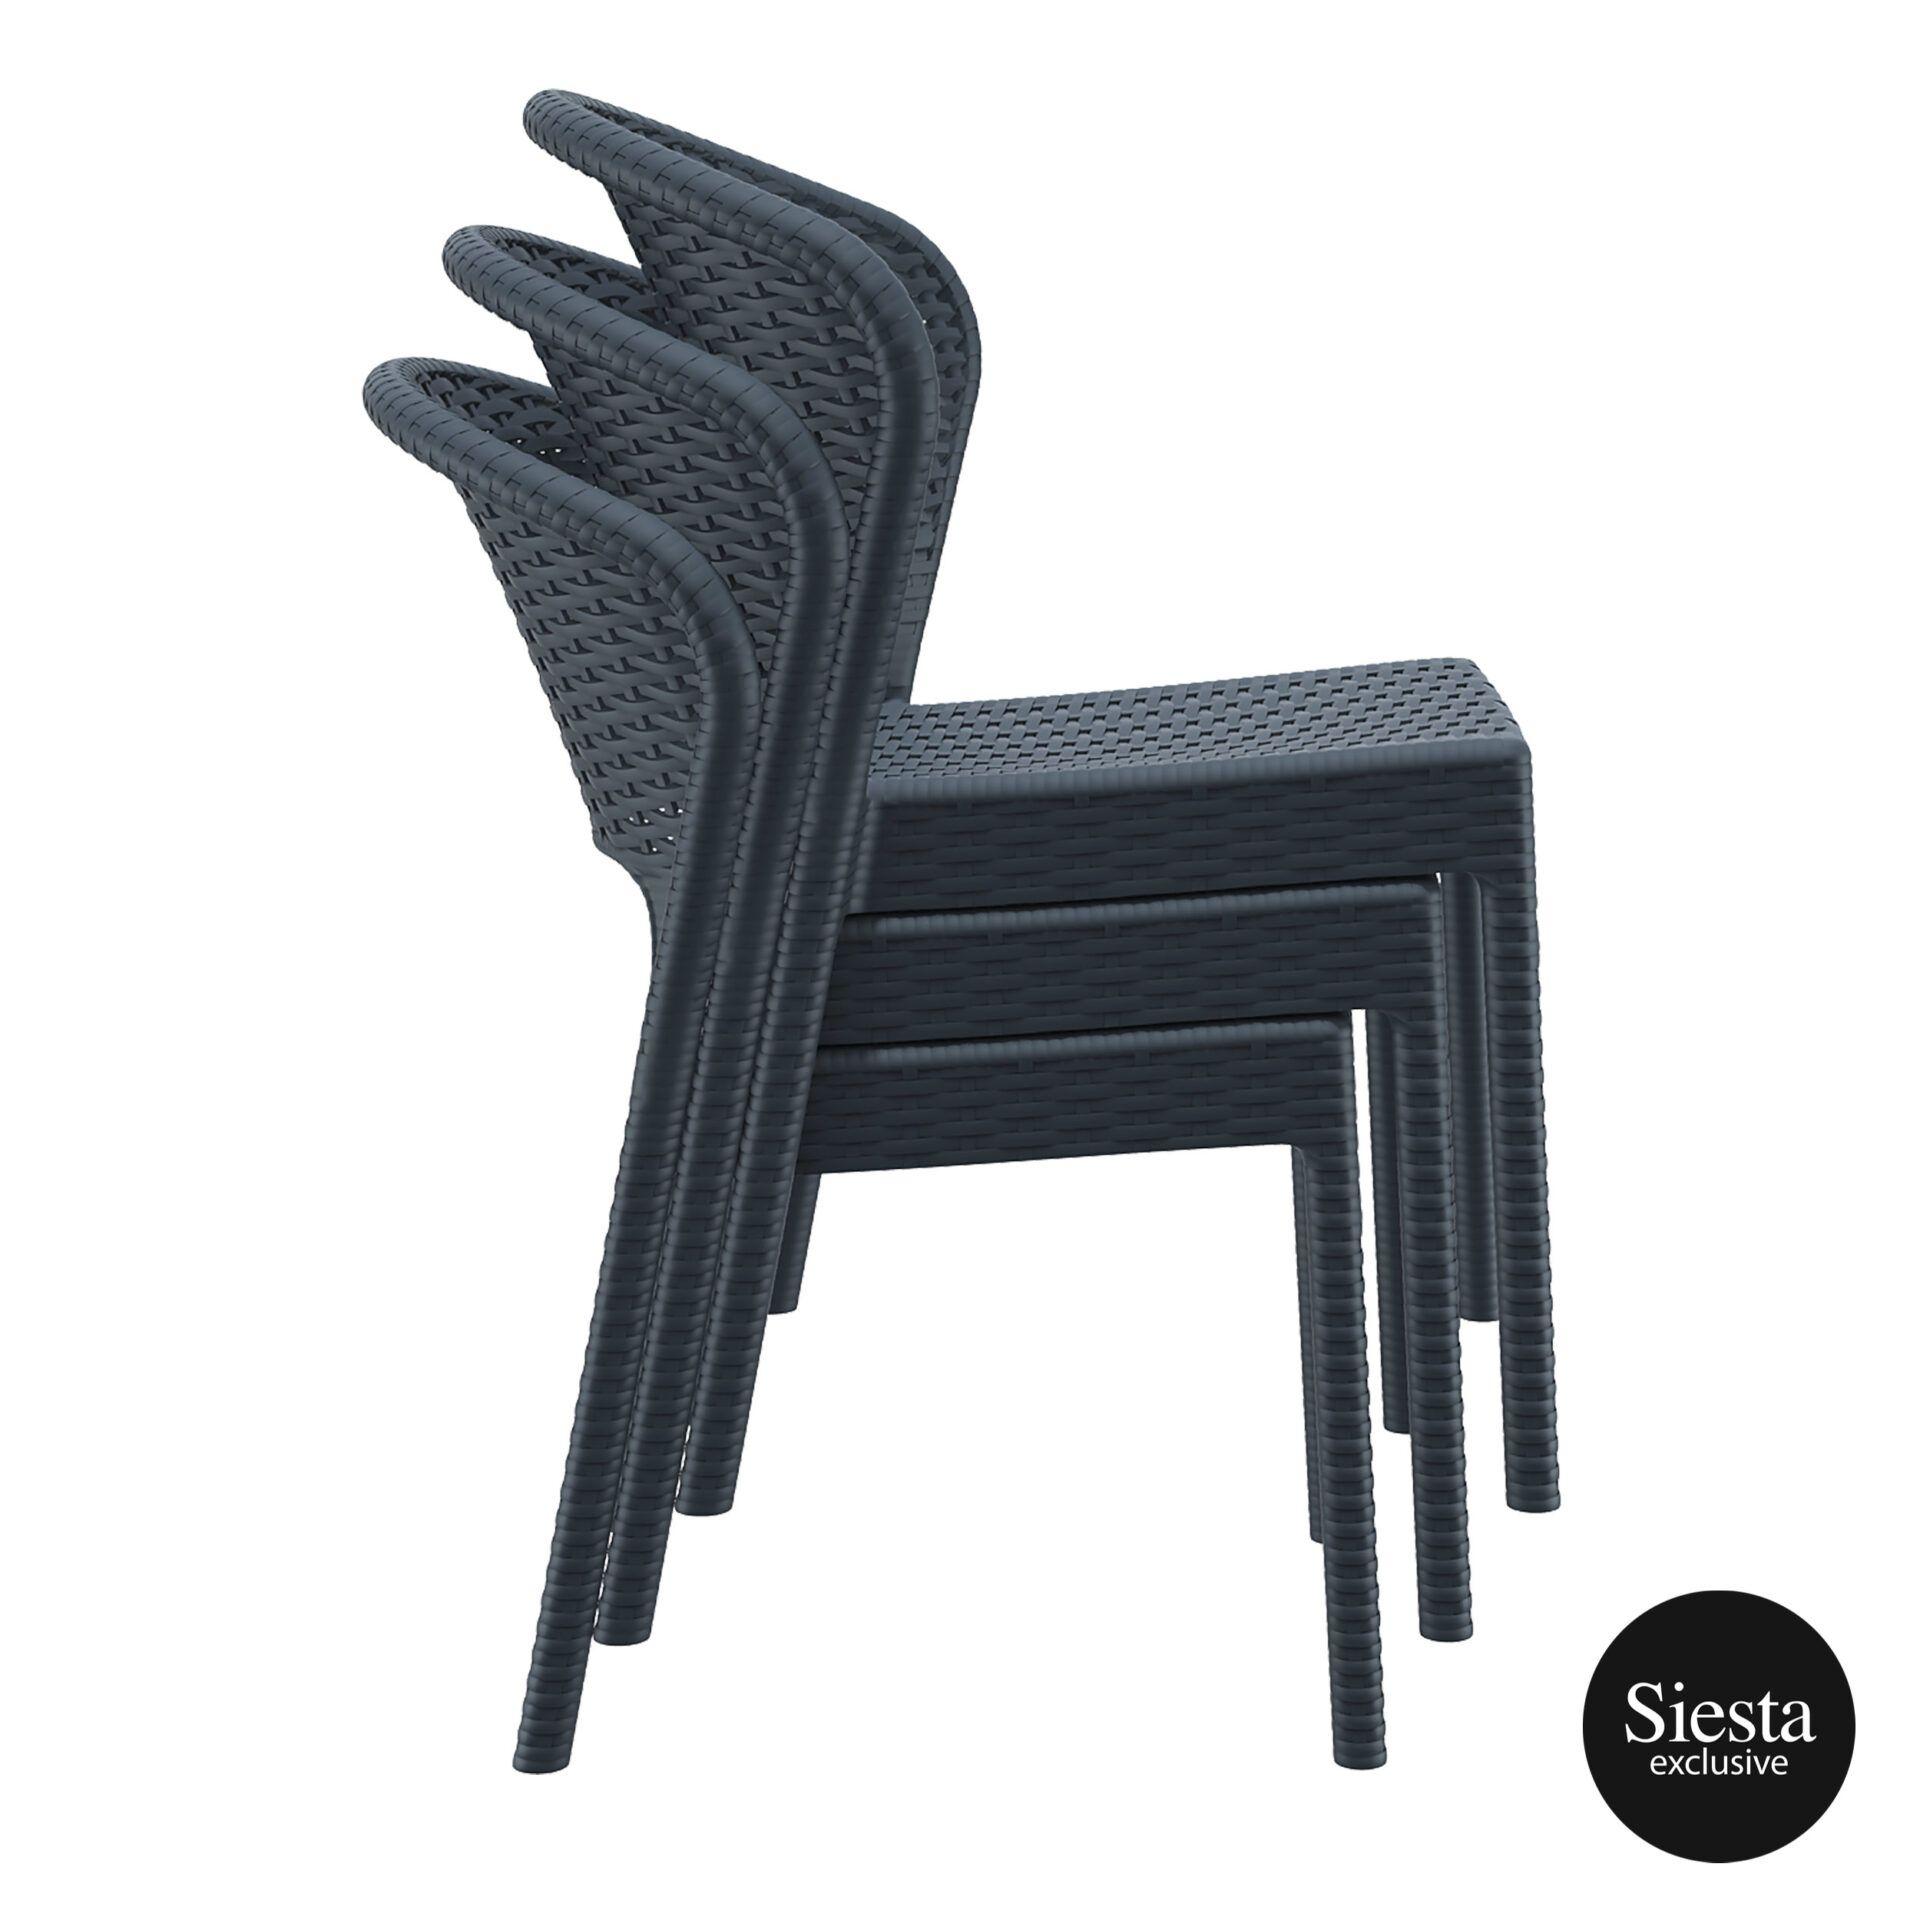 resin rattan outdoor daytona chair stack